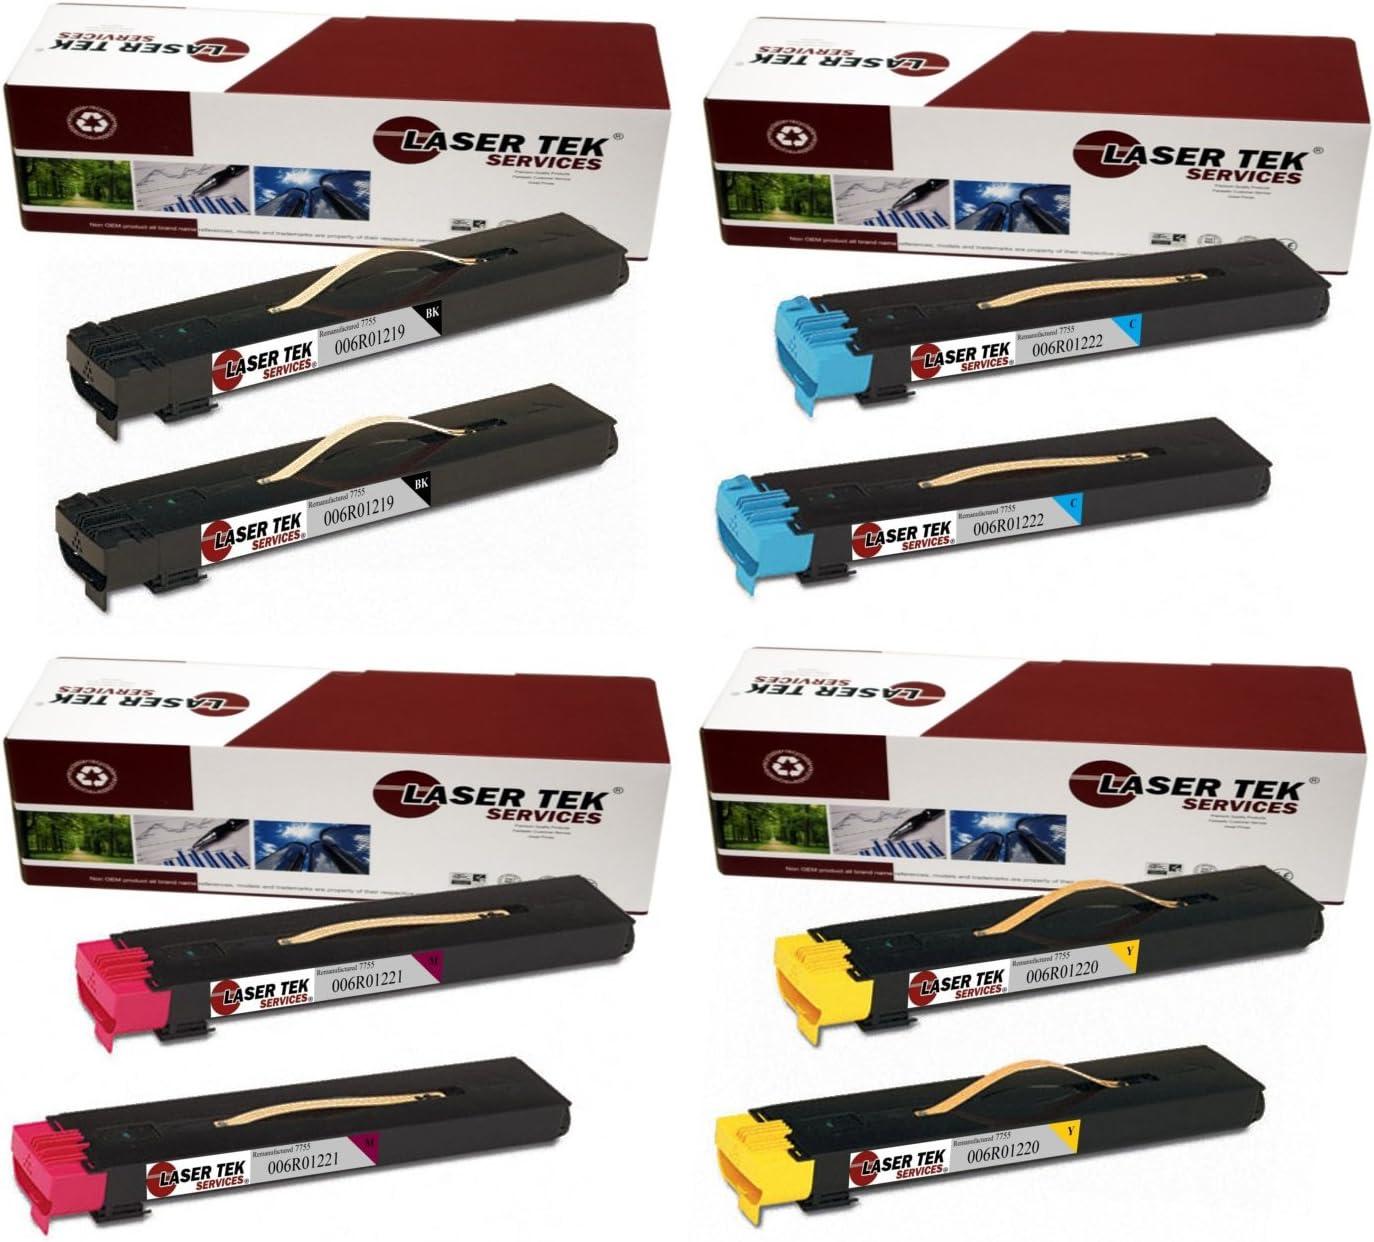 006R01219 Black, 3 Pack MS Imaging Supply Laser Toner Cartridge Cartridge Replacement for Xerox 6R1219